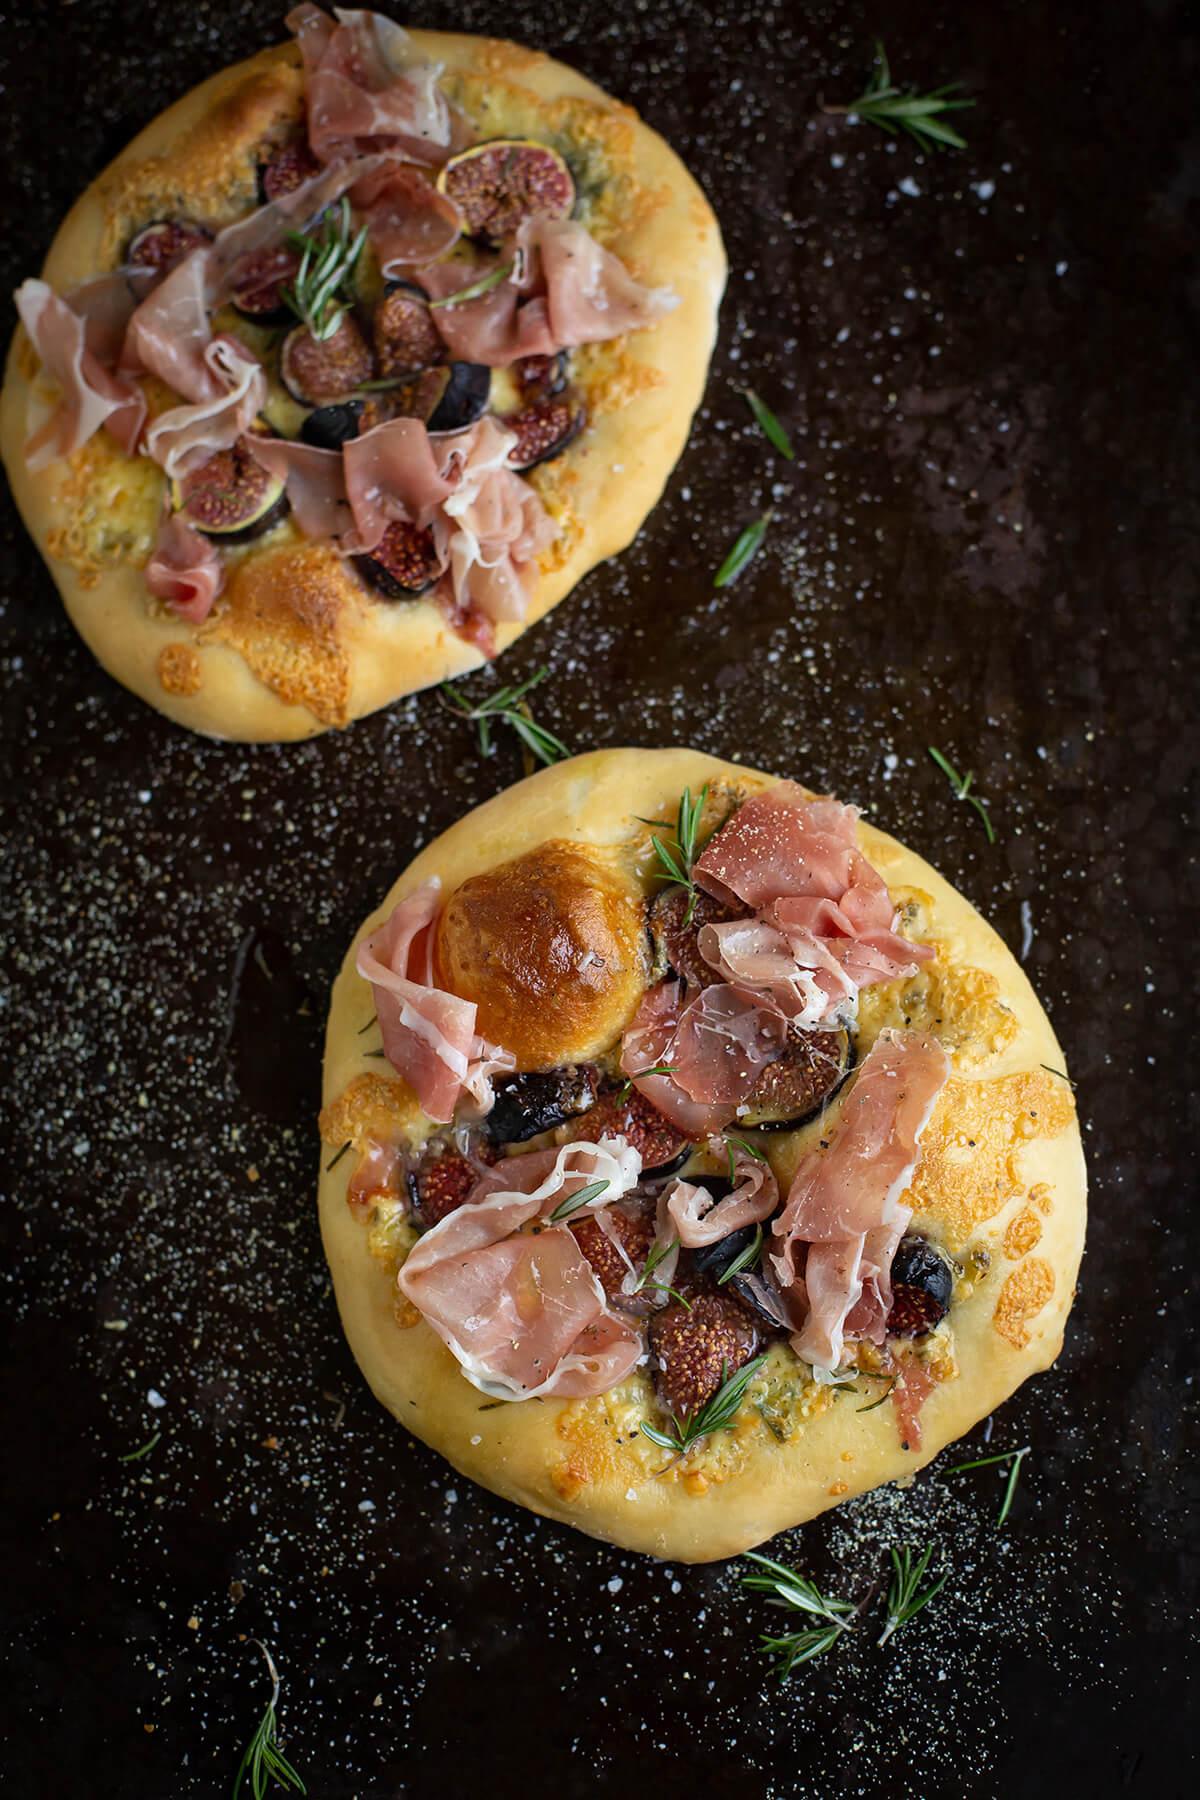 Pizzette with blue cheese, figs & prosciutto recipe